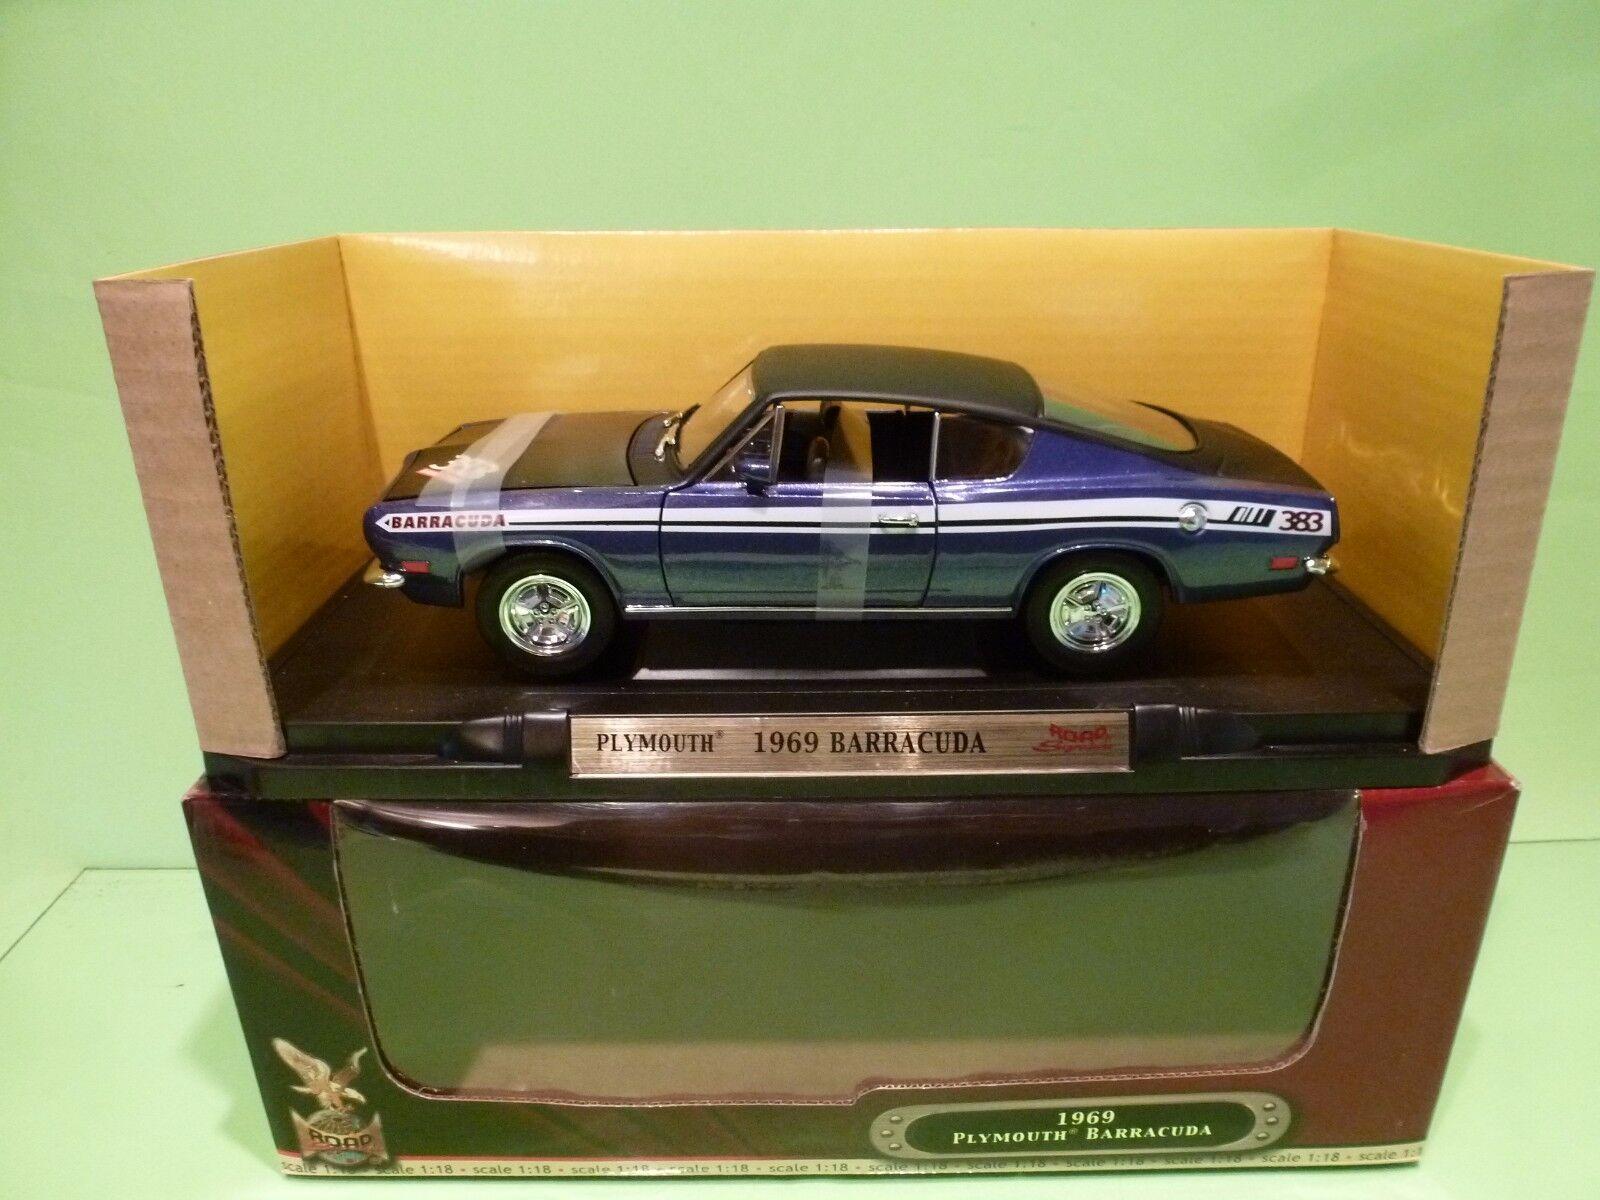 YATMING 92179 PLYMOUTH BARRACUDA 1969 1969 1969 - METALLIC púrpura 1 18 - EXCELLENT IN BOX c4a215